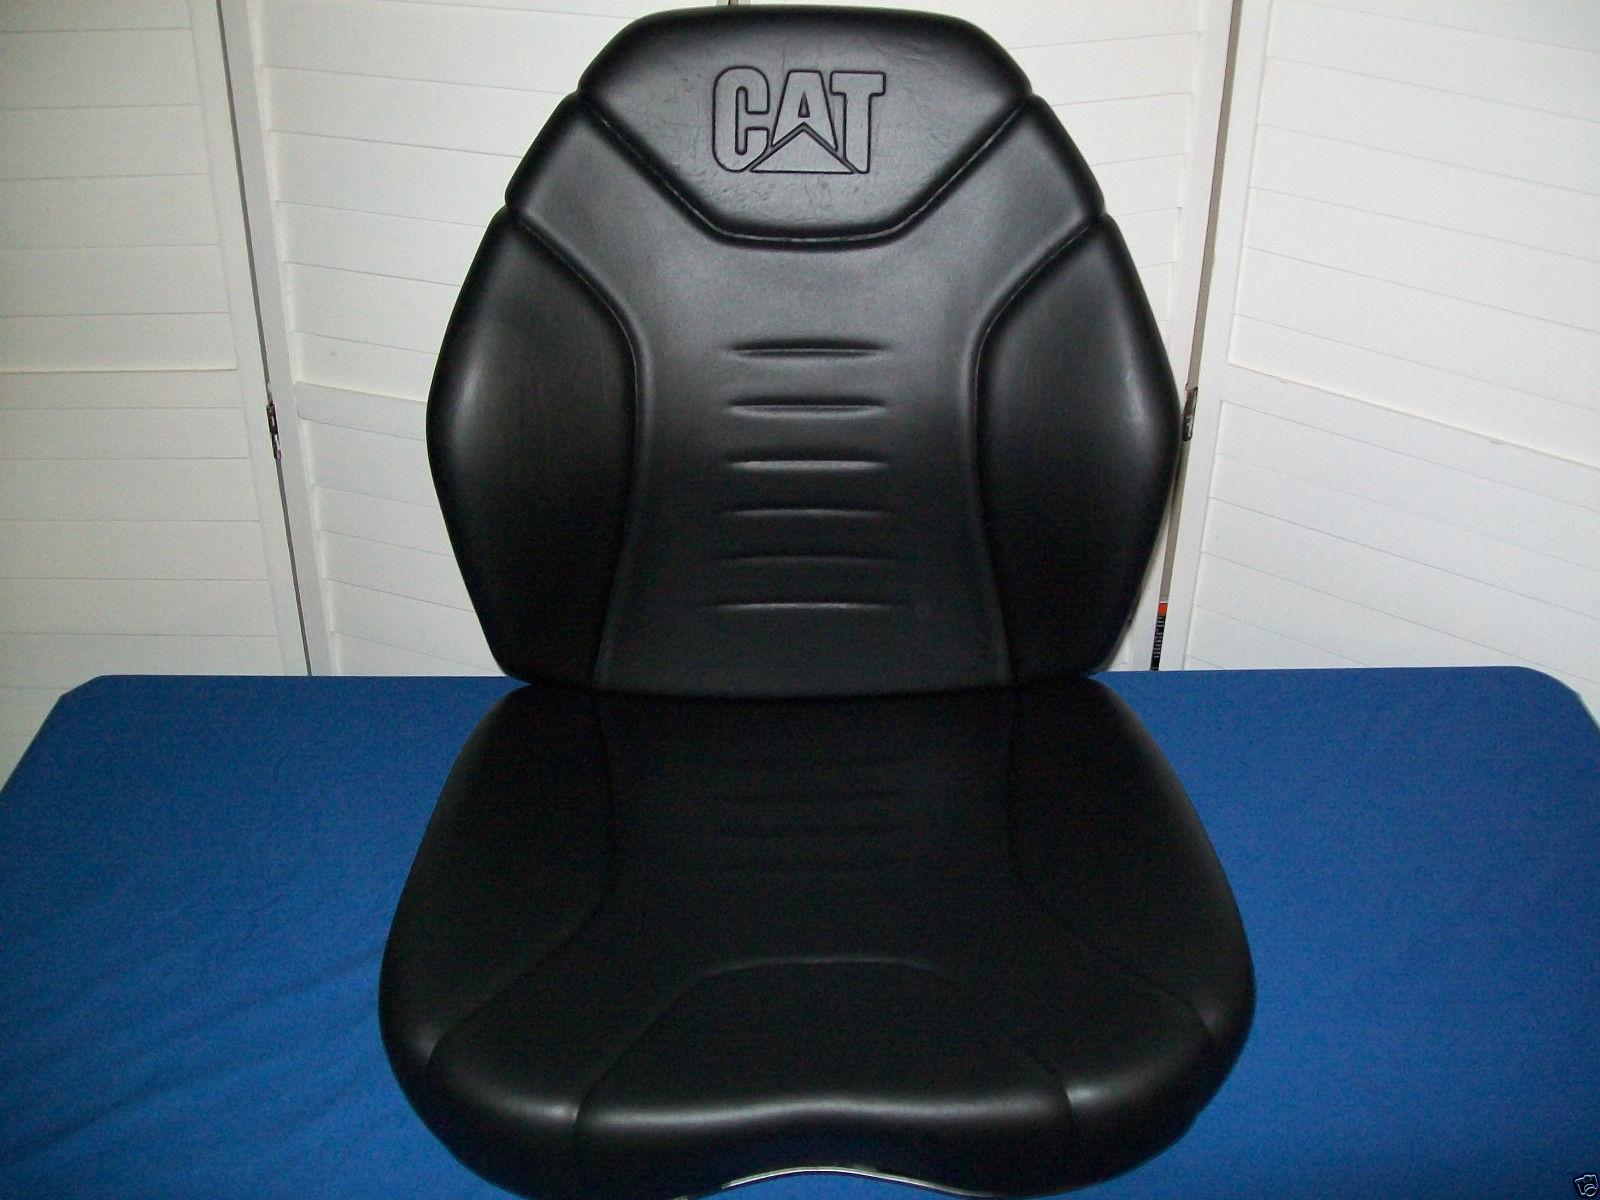 Cat Caterpillar Suspension Seat Replacement Cushion Kit Compact 257b Wiring Diagram Wheel Loader Jt